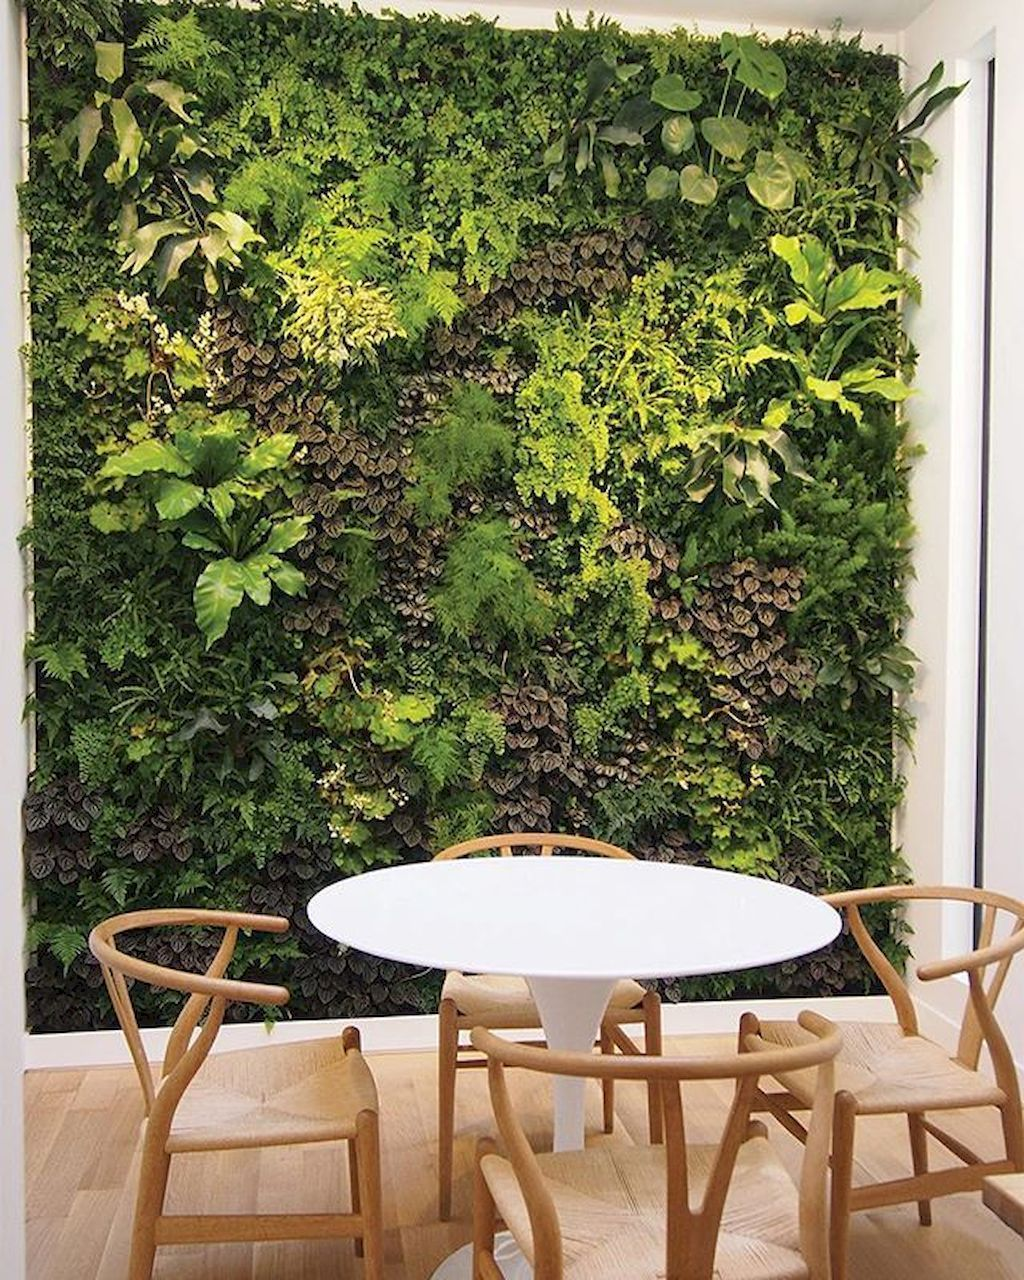 The Best Indoor Garden Ideas To Beautify Your Home 26